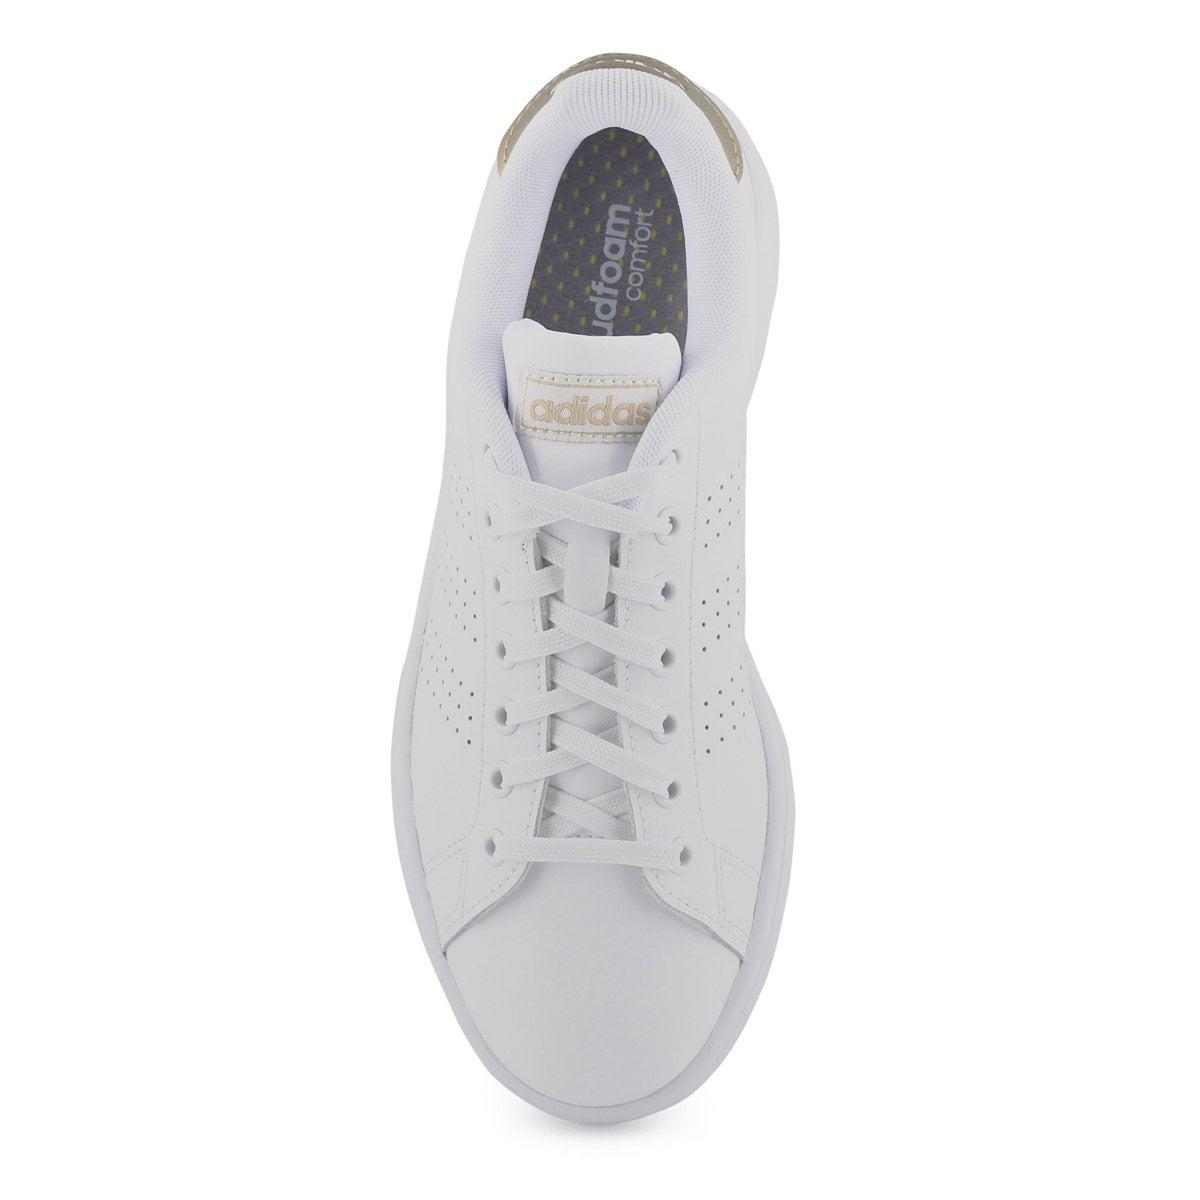 Women's Advantage Sneaker - White /Copper